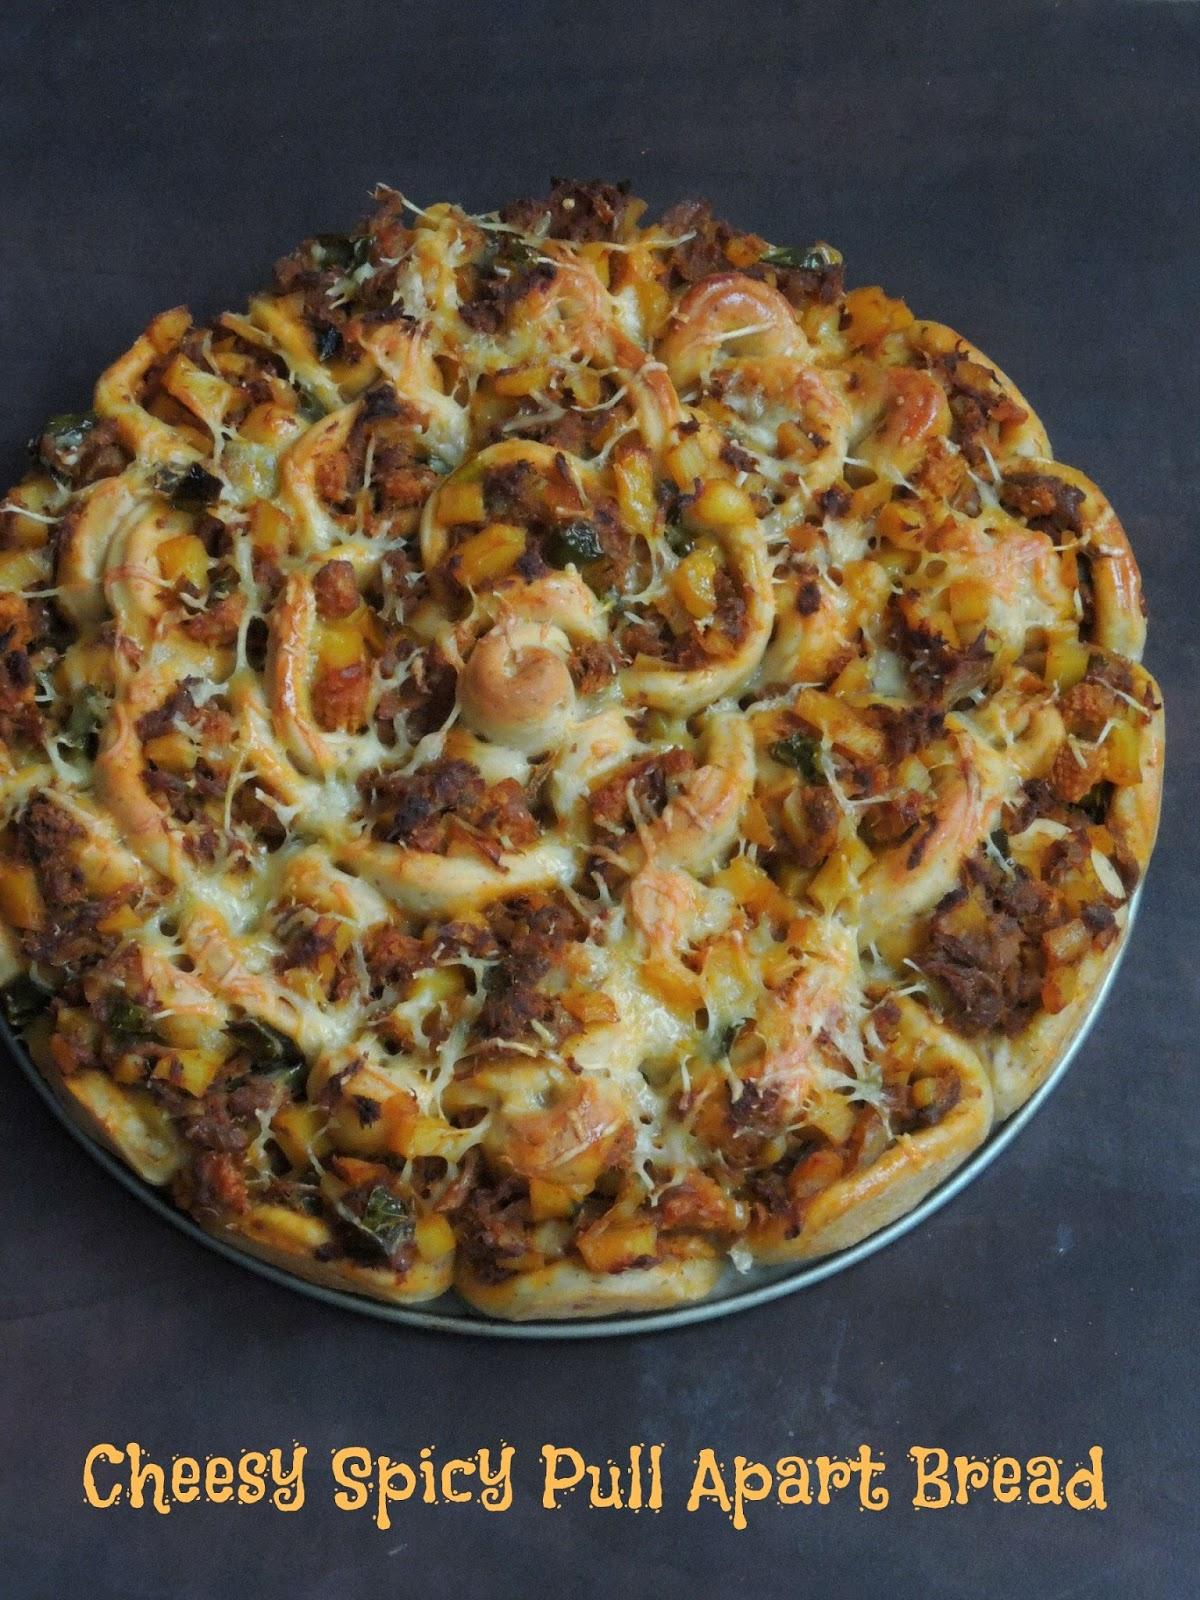 Priya's Versatile Recipes: Cheesy Spicy Pull Apart Bread ...